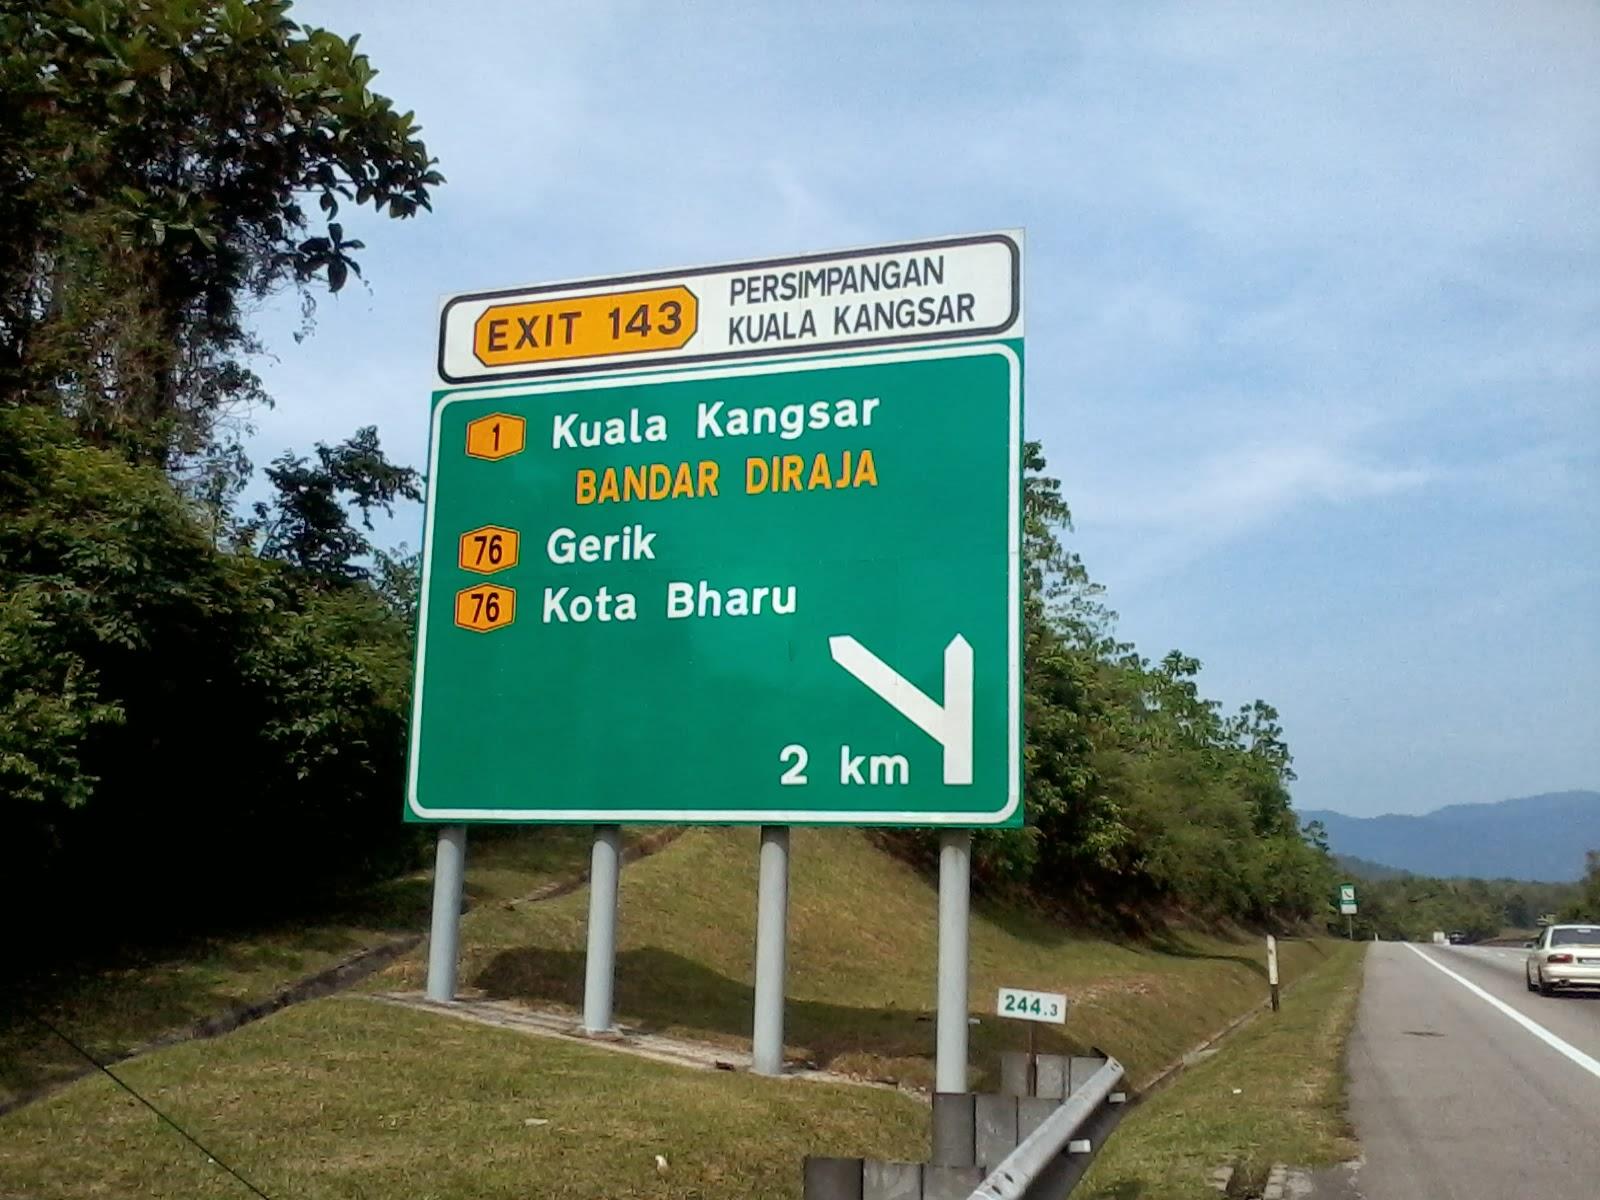 Bromalim Perjalanan Ke Kuala Kangsar